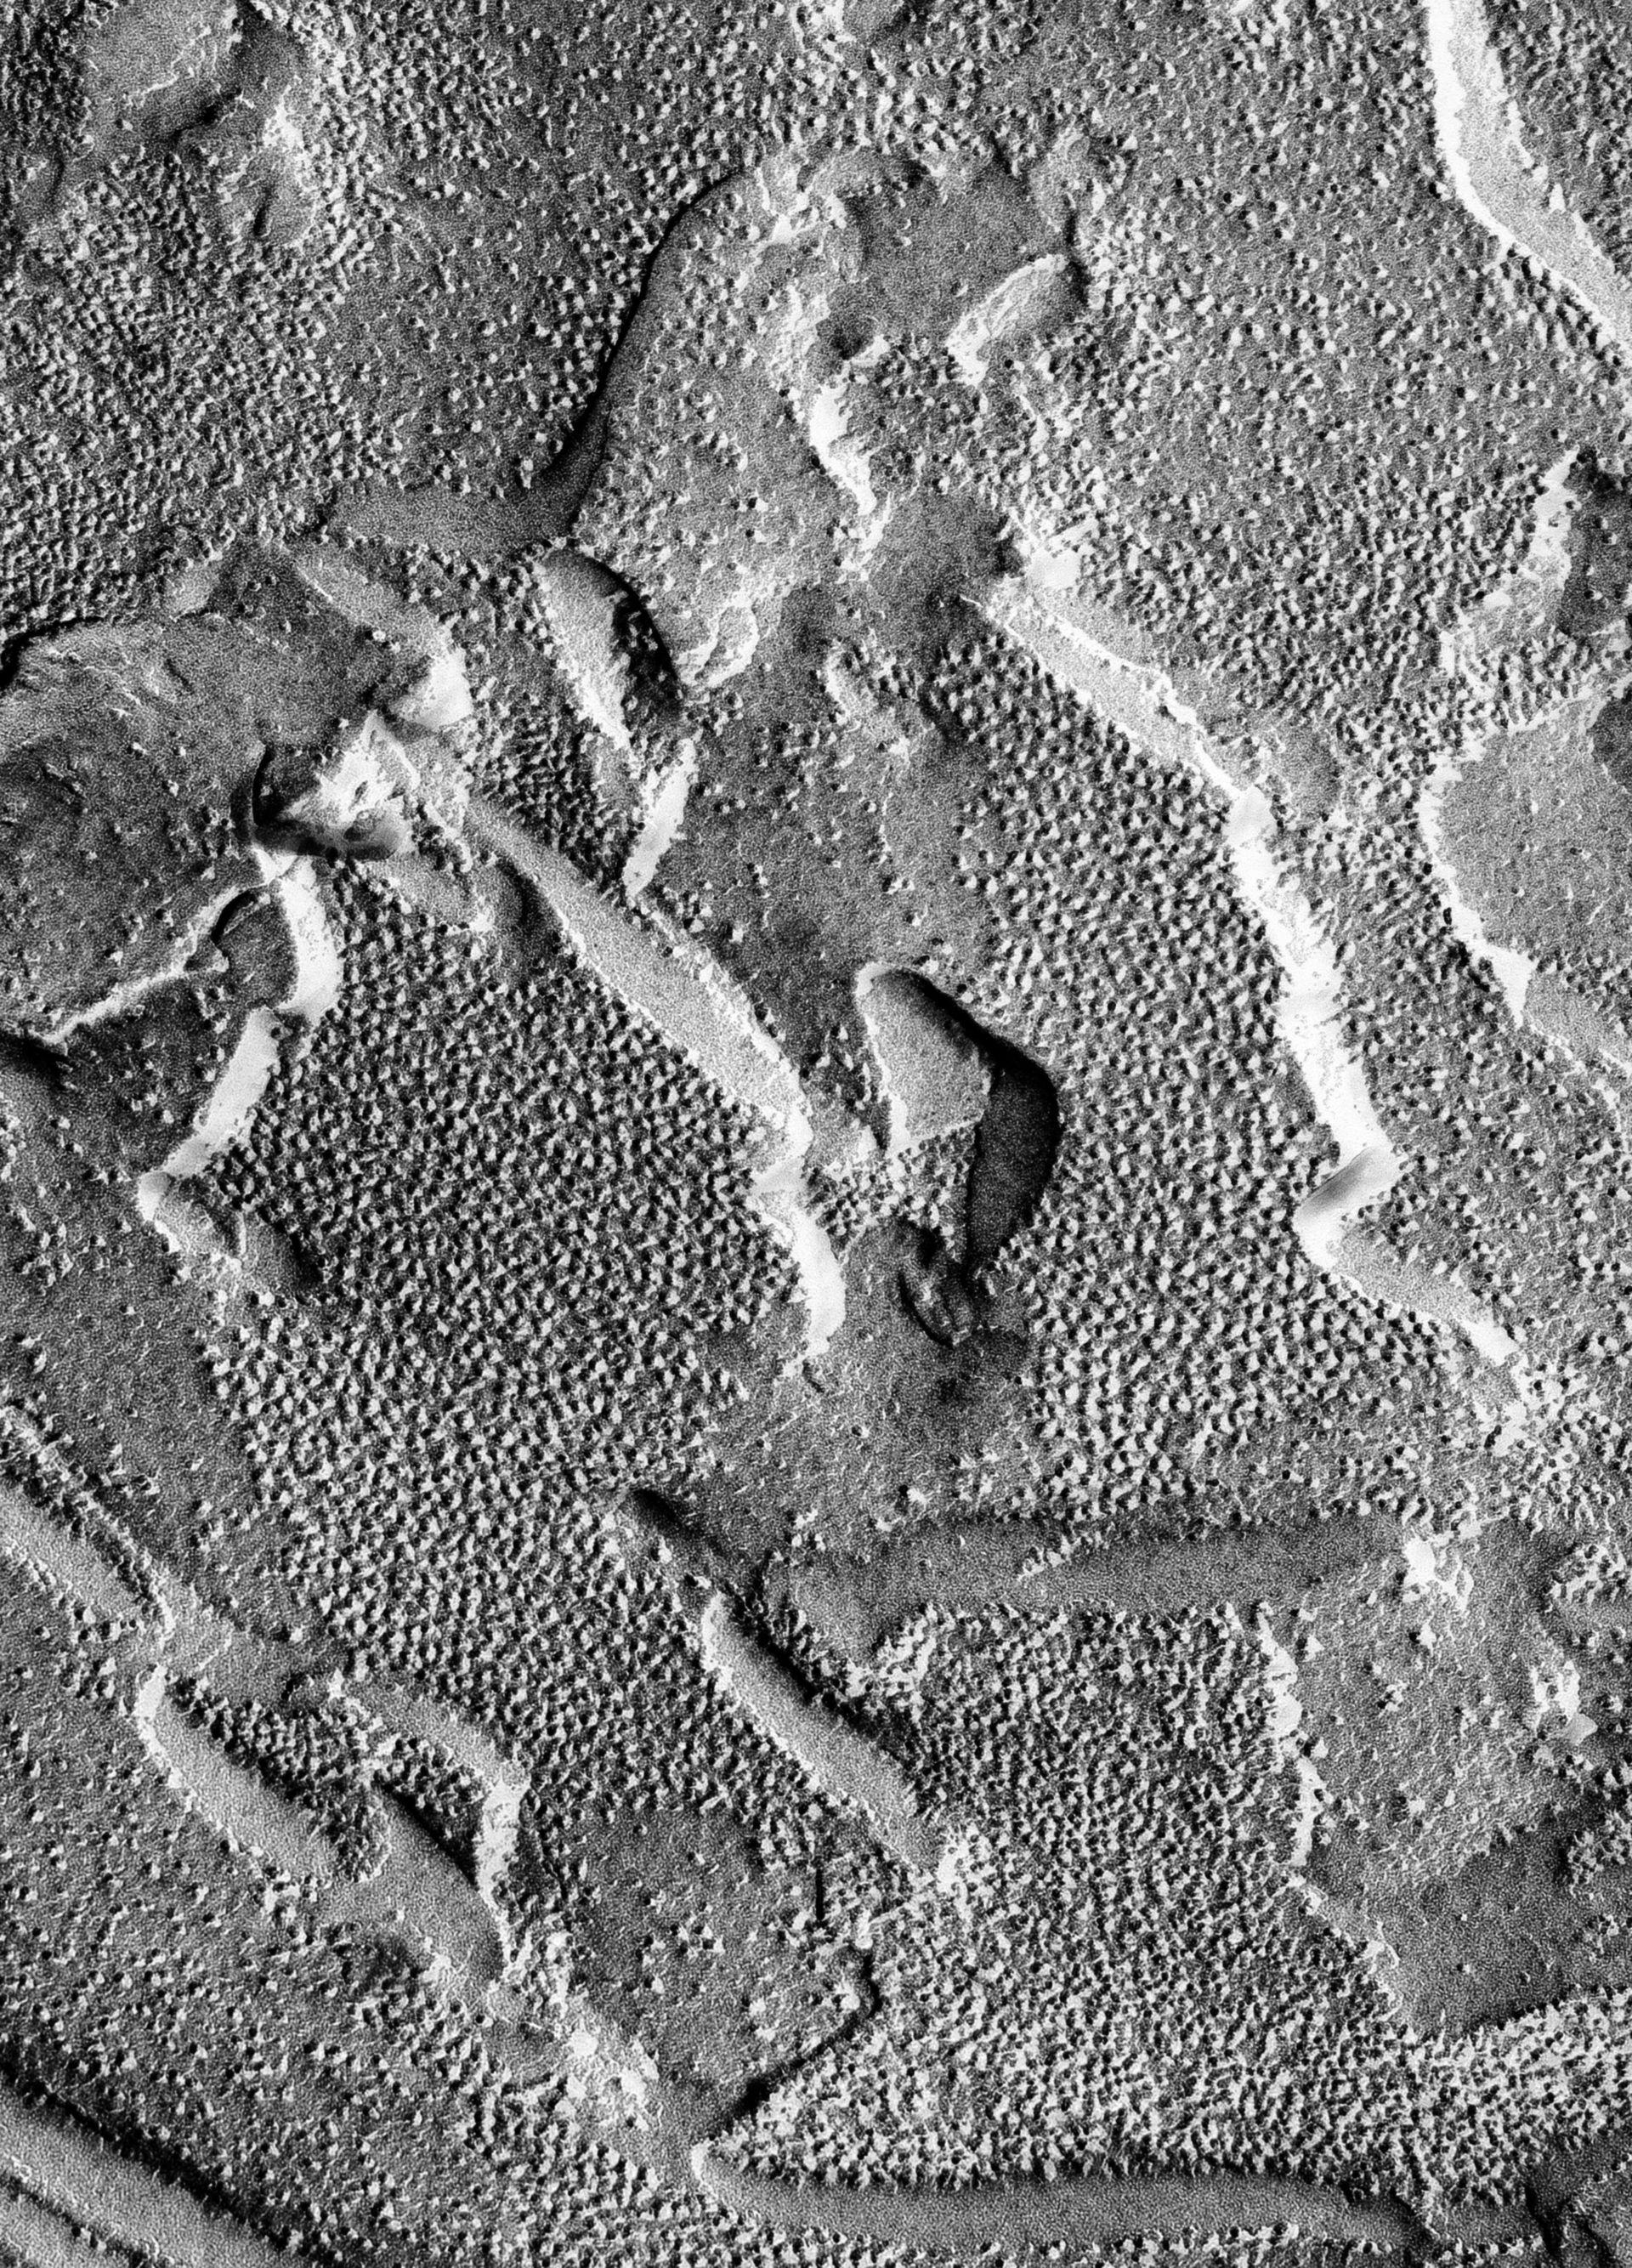 Prochloron (Thylakoid) - CIL:16473